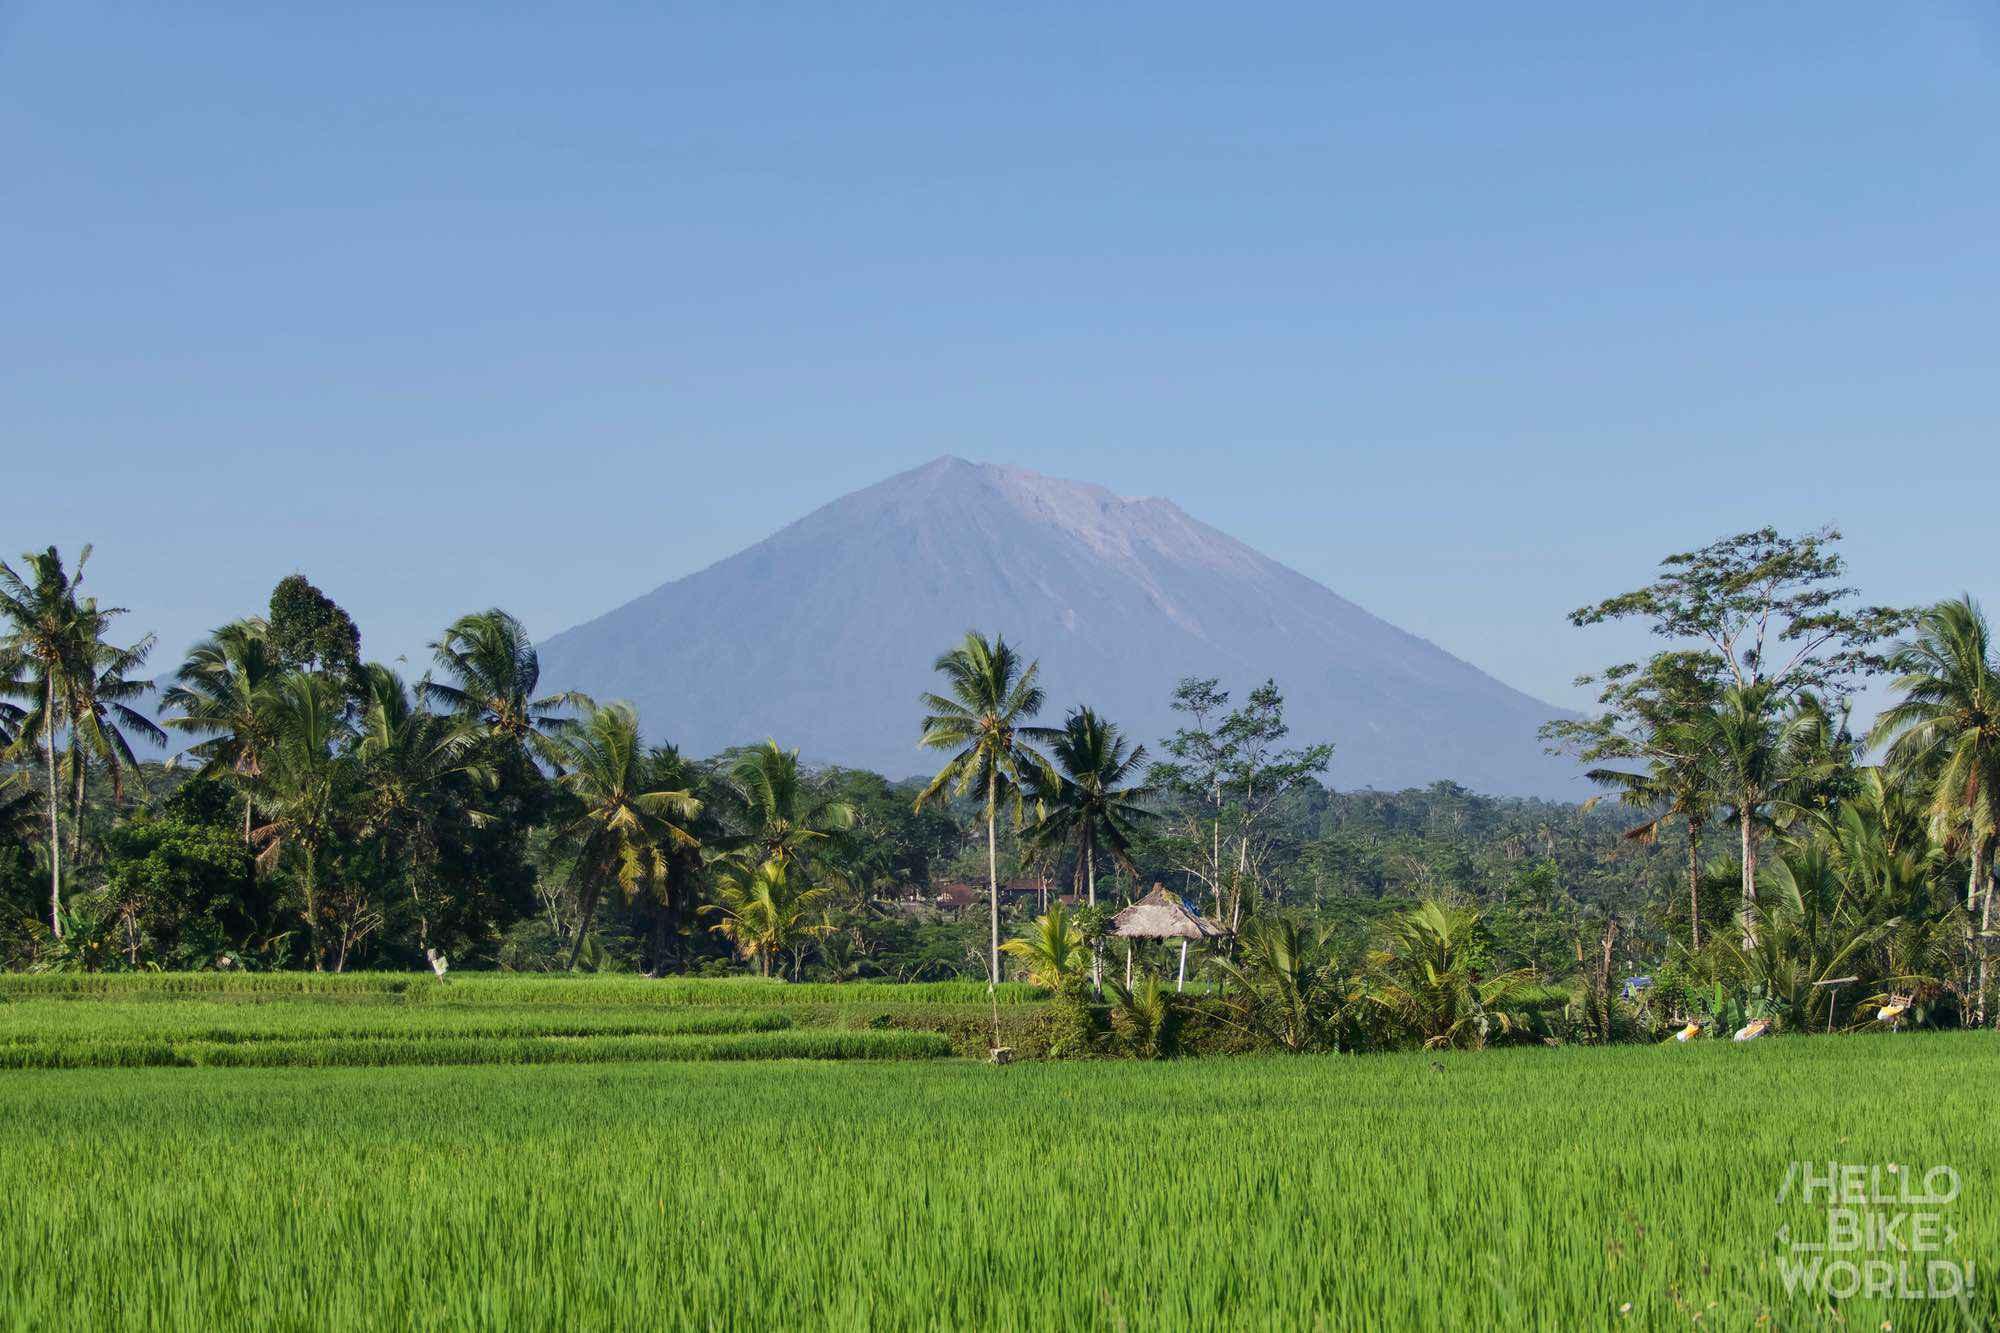 Vista del Monte Agung